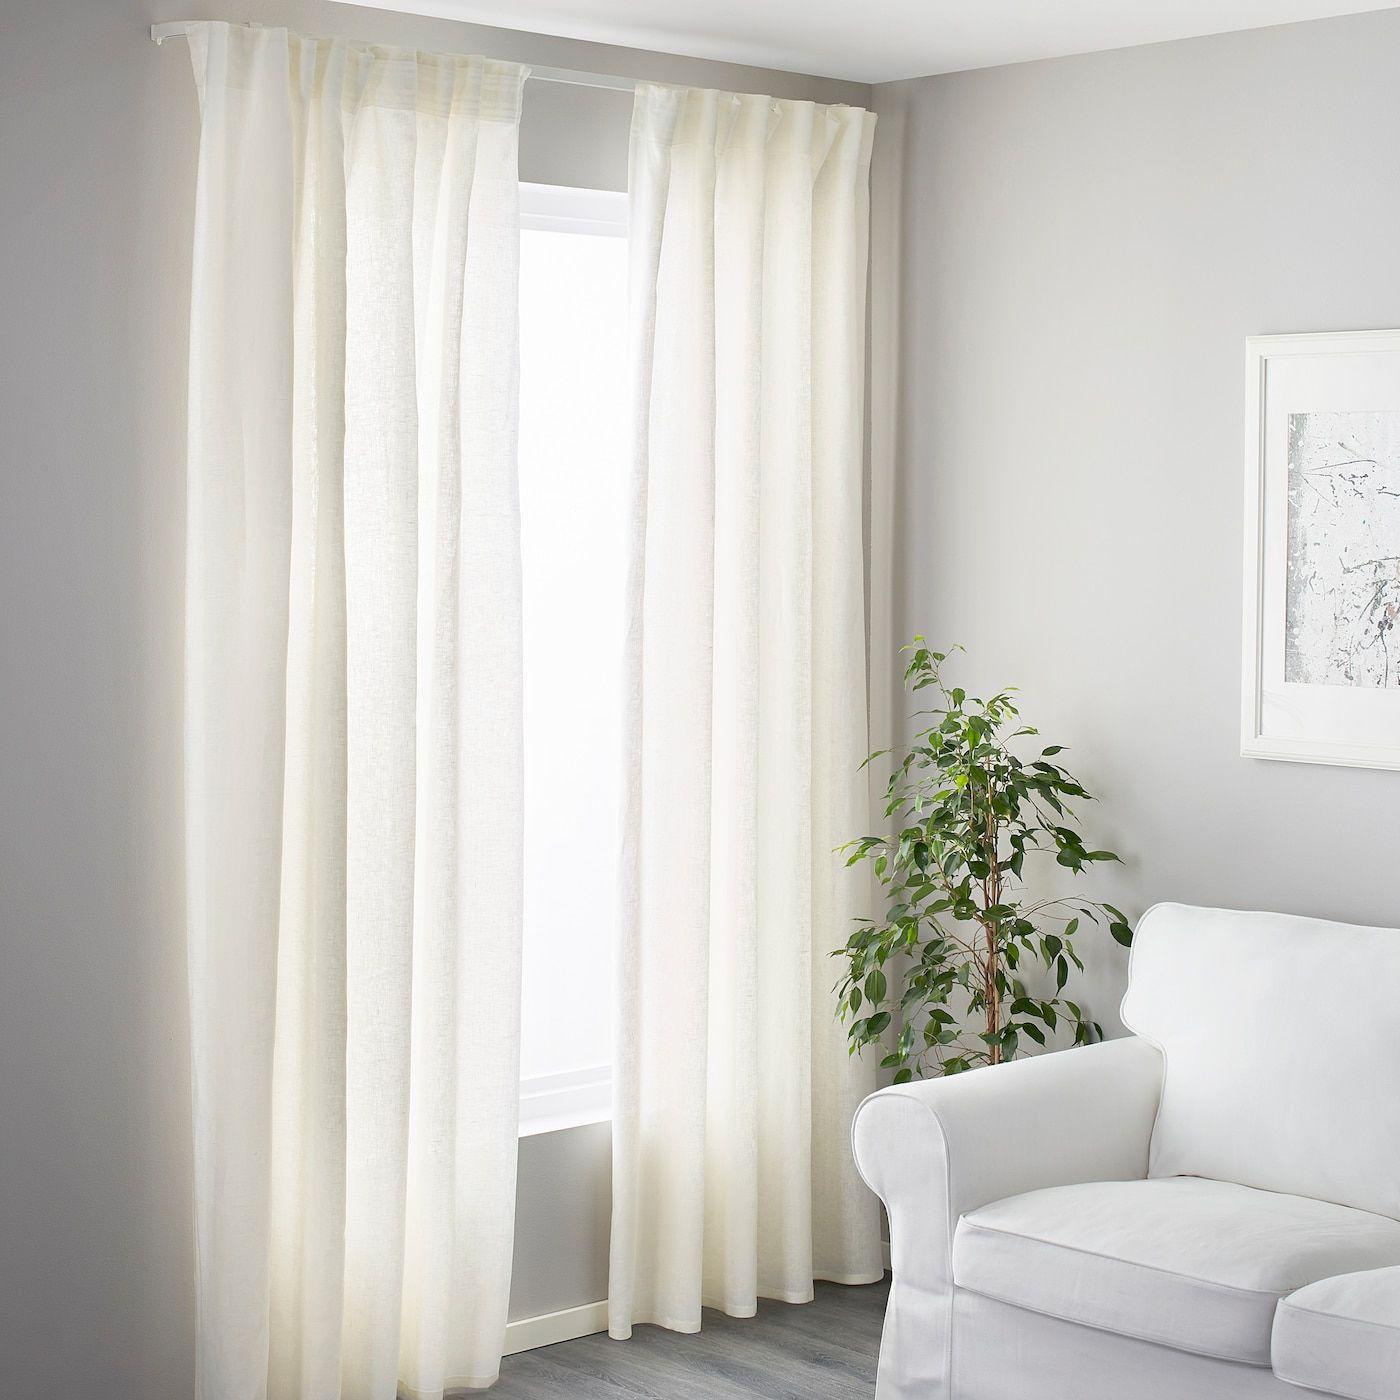 ikea curtain rails cool curtains